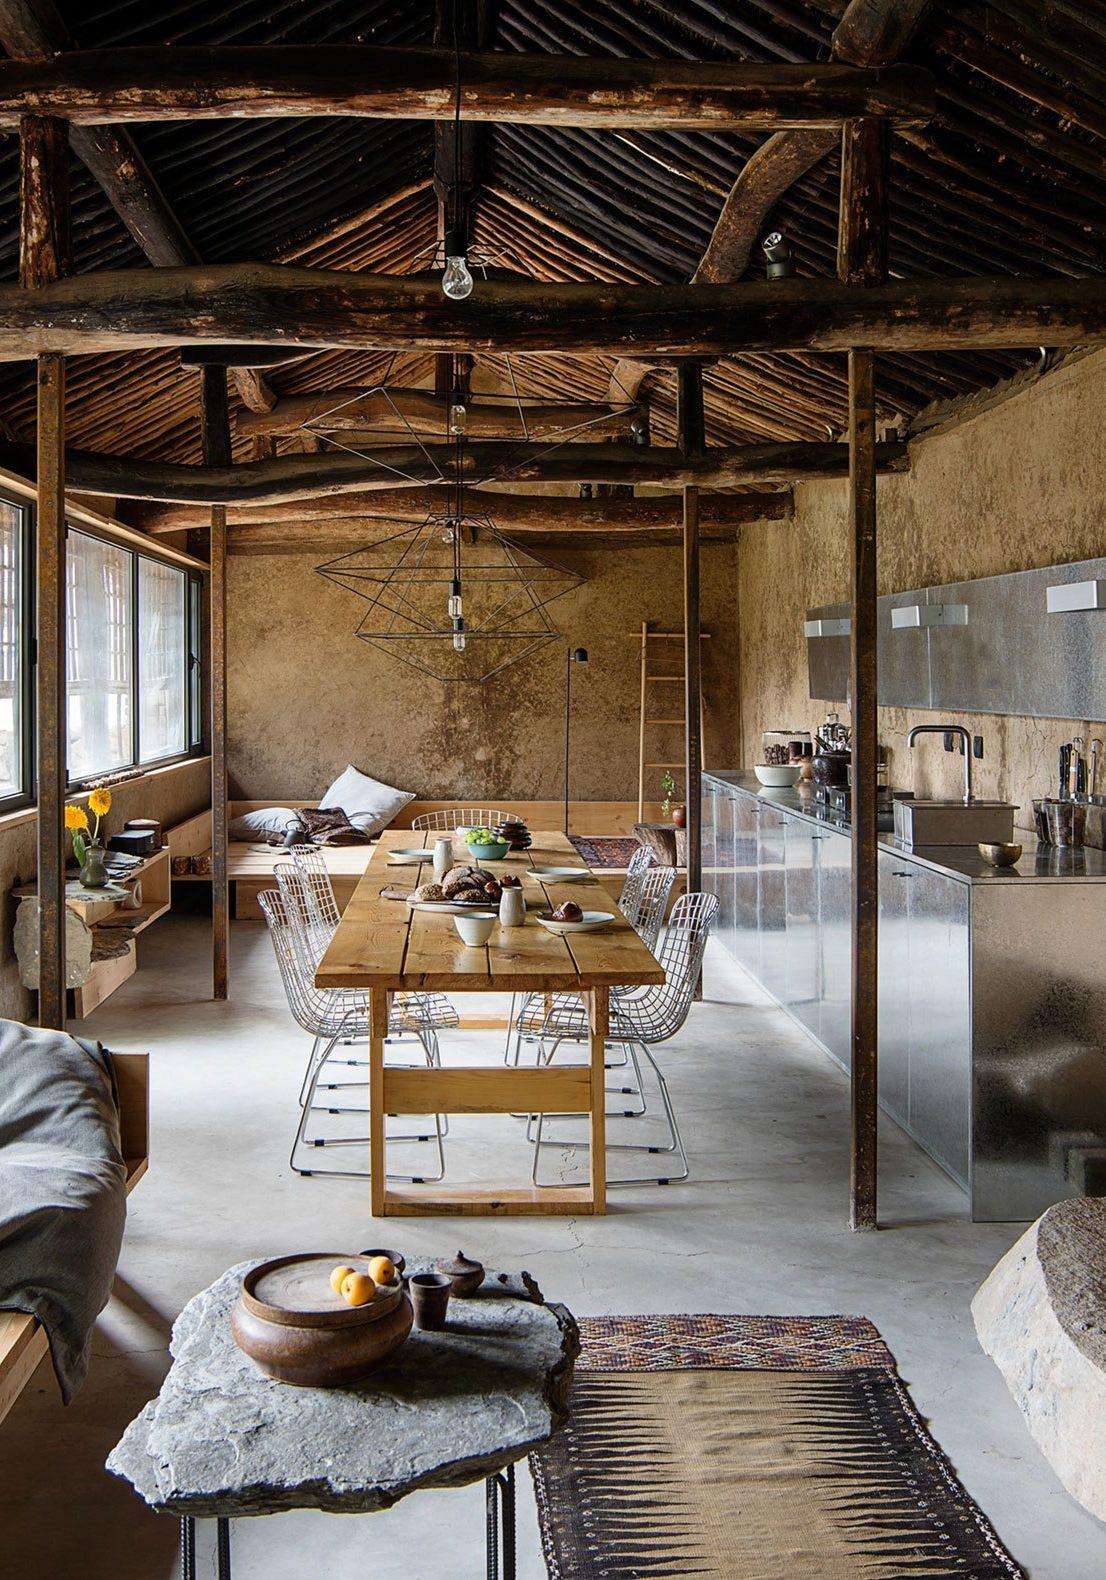 El tándem Taeubert-Min revitaliza la vivienda rural china con su Studio Cottage